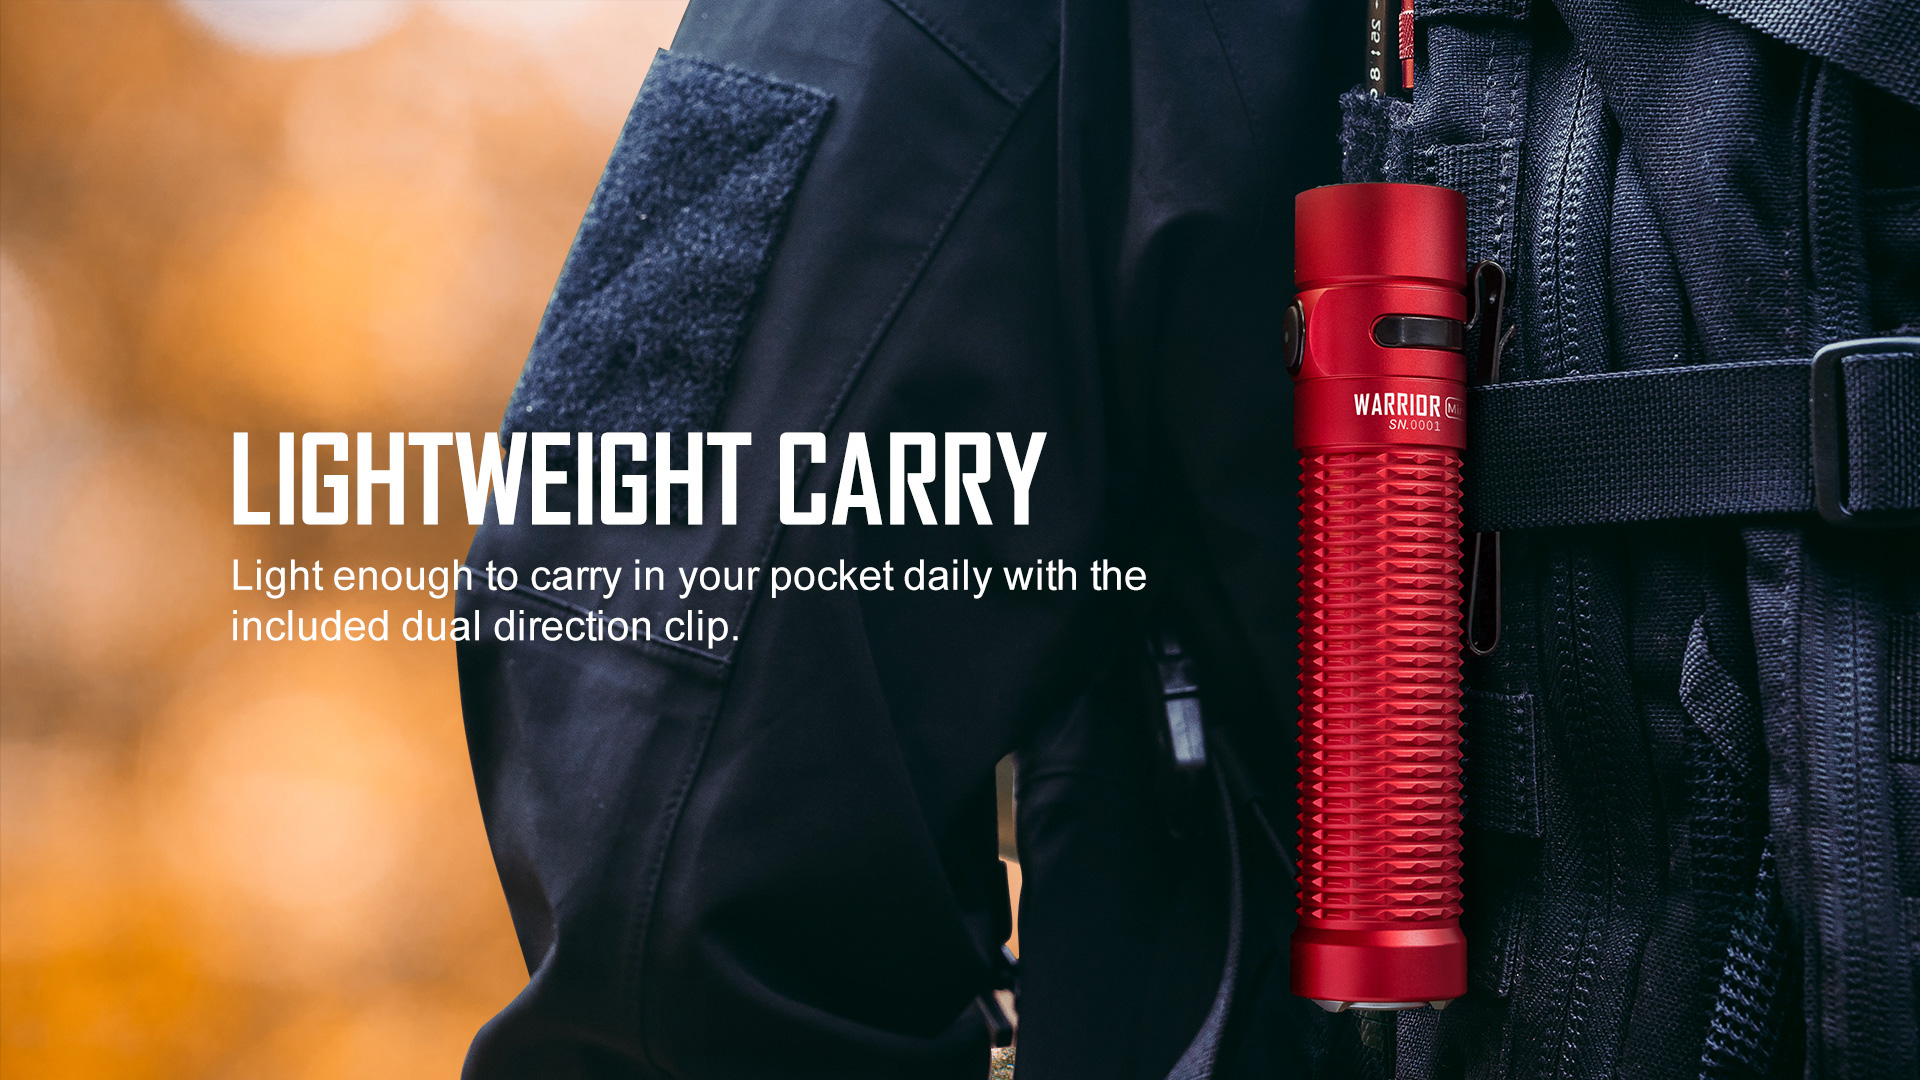 Lightweight and portable high end EDC flashlight